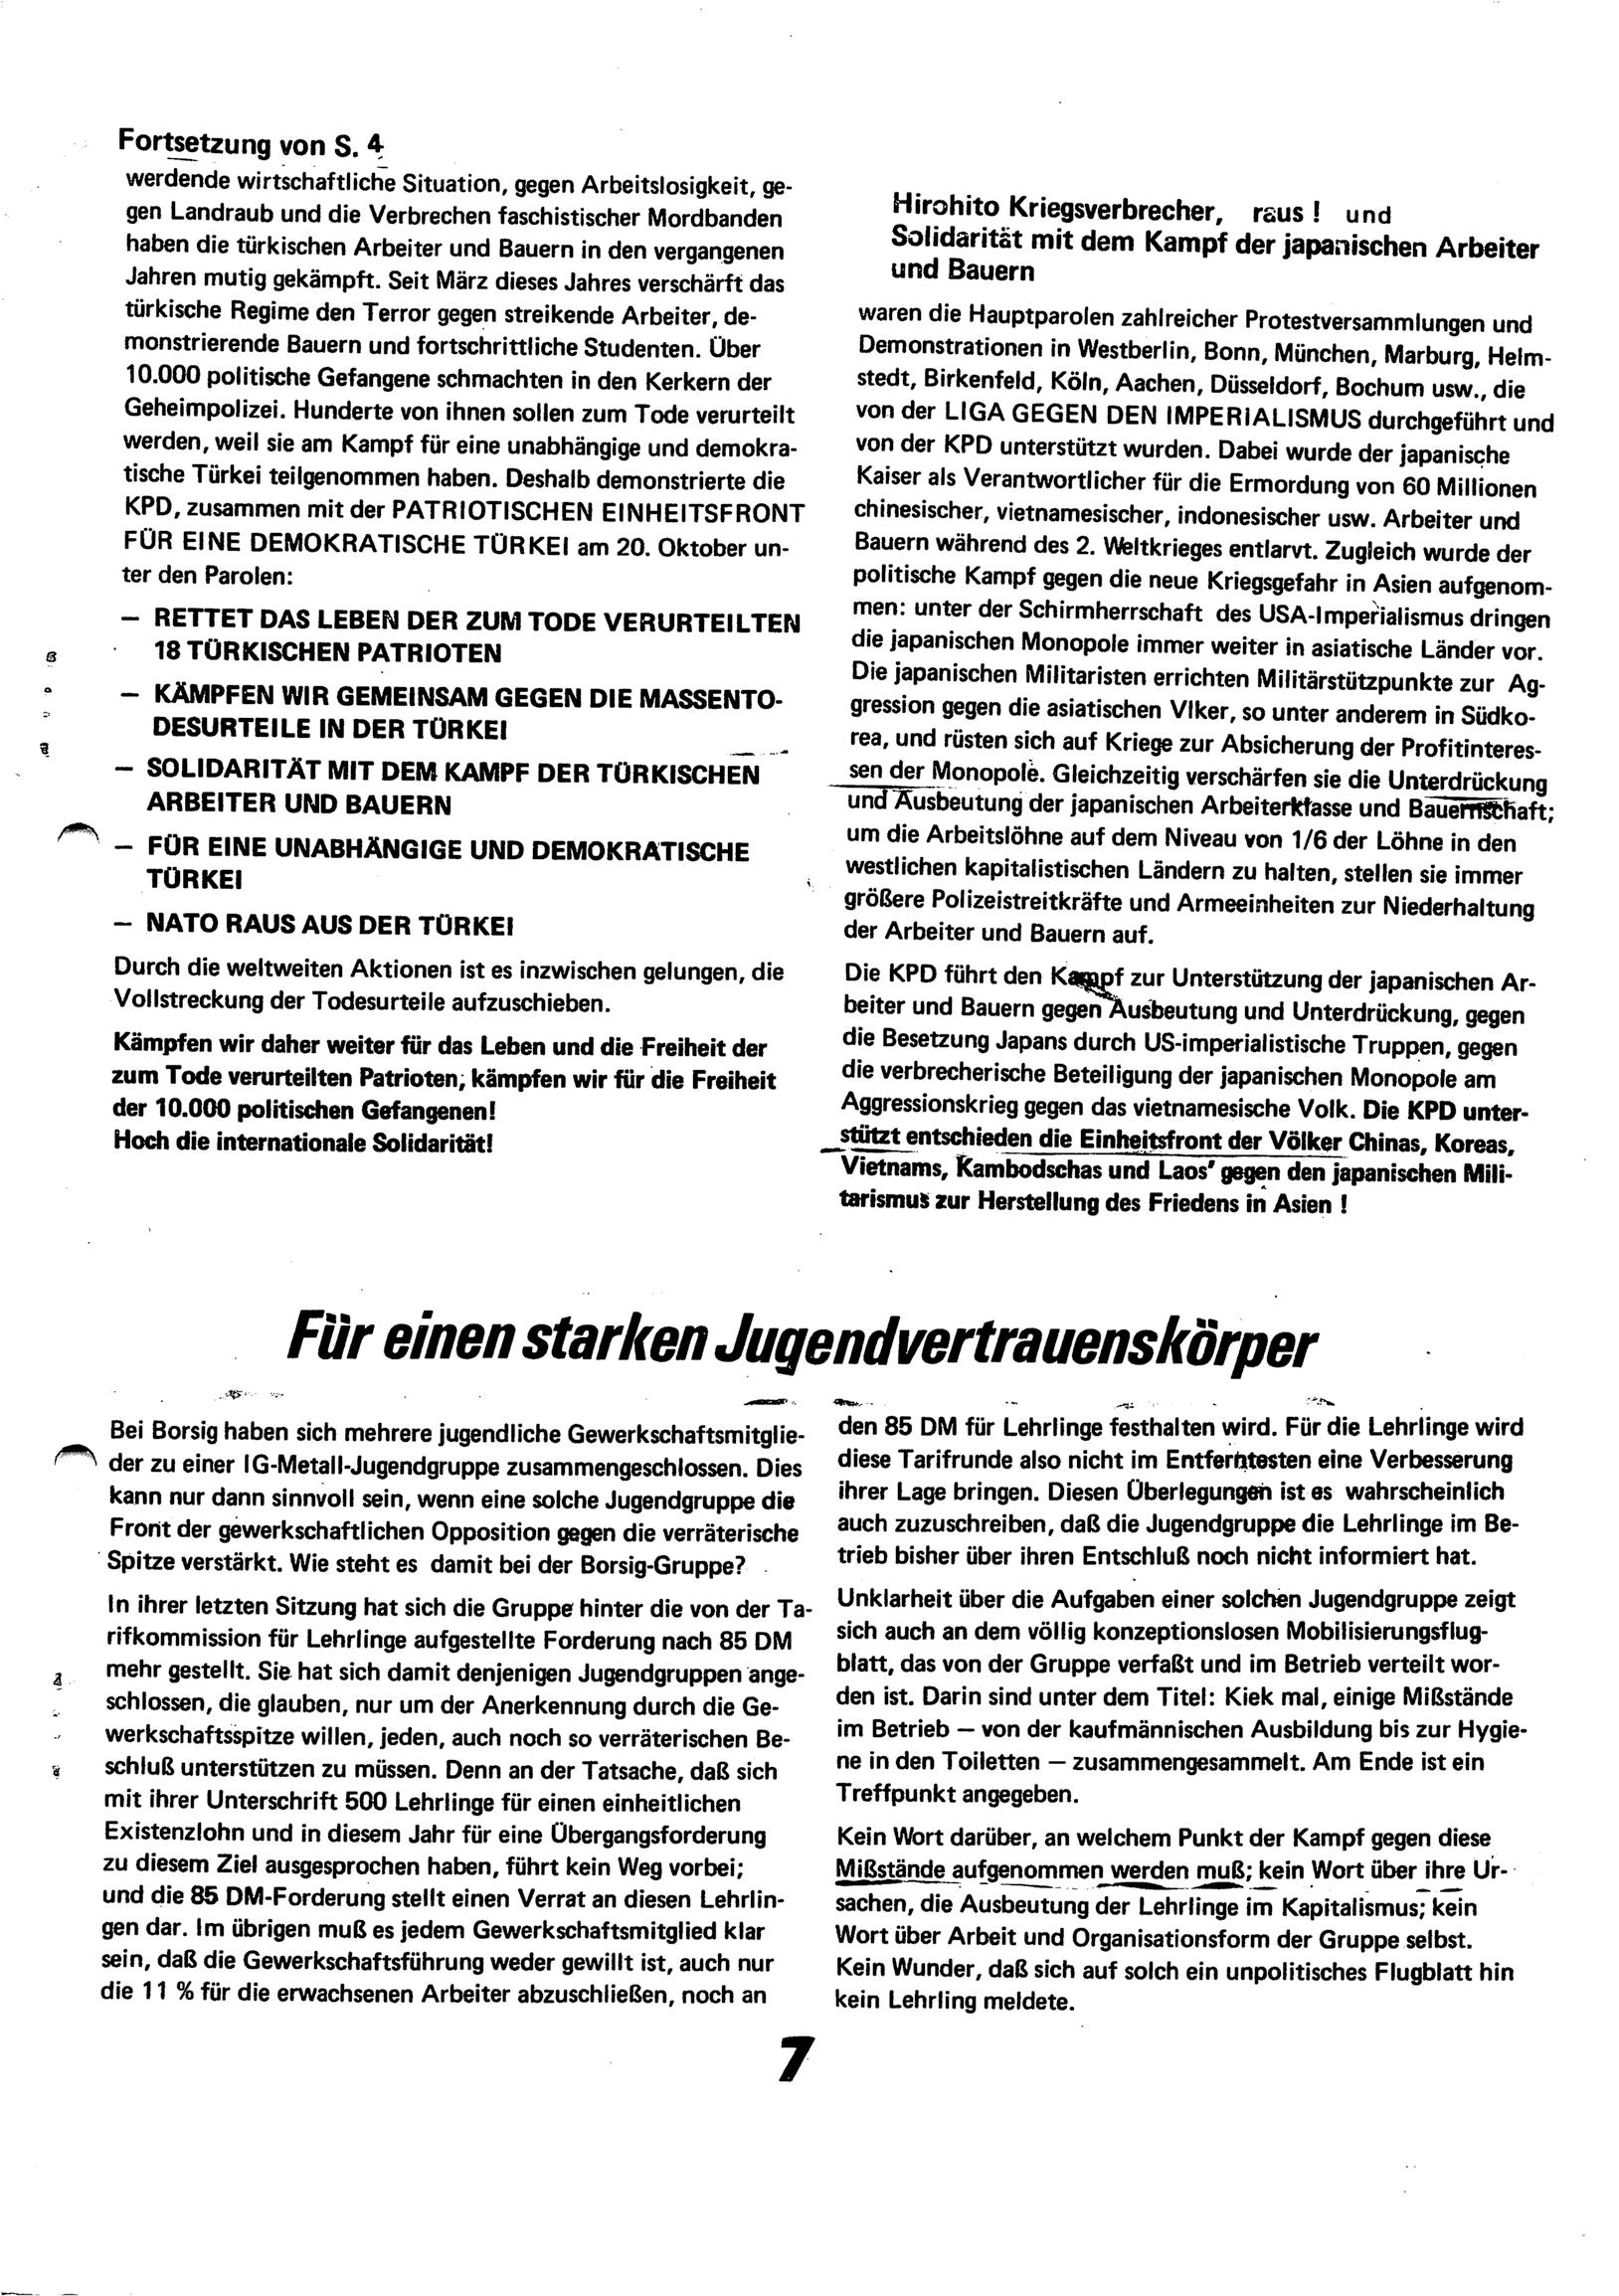 Berlin_Borsig322